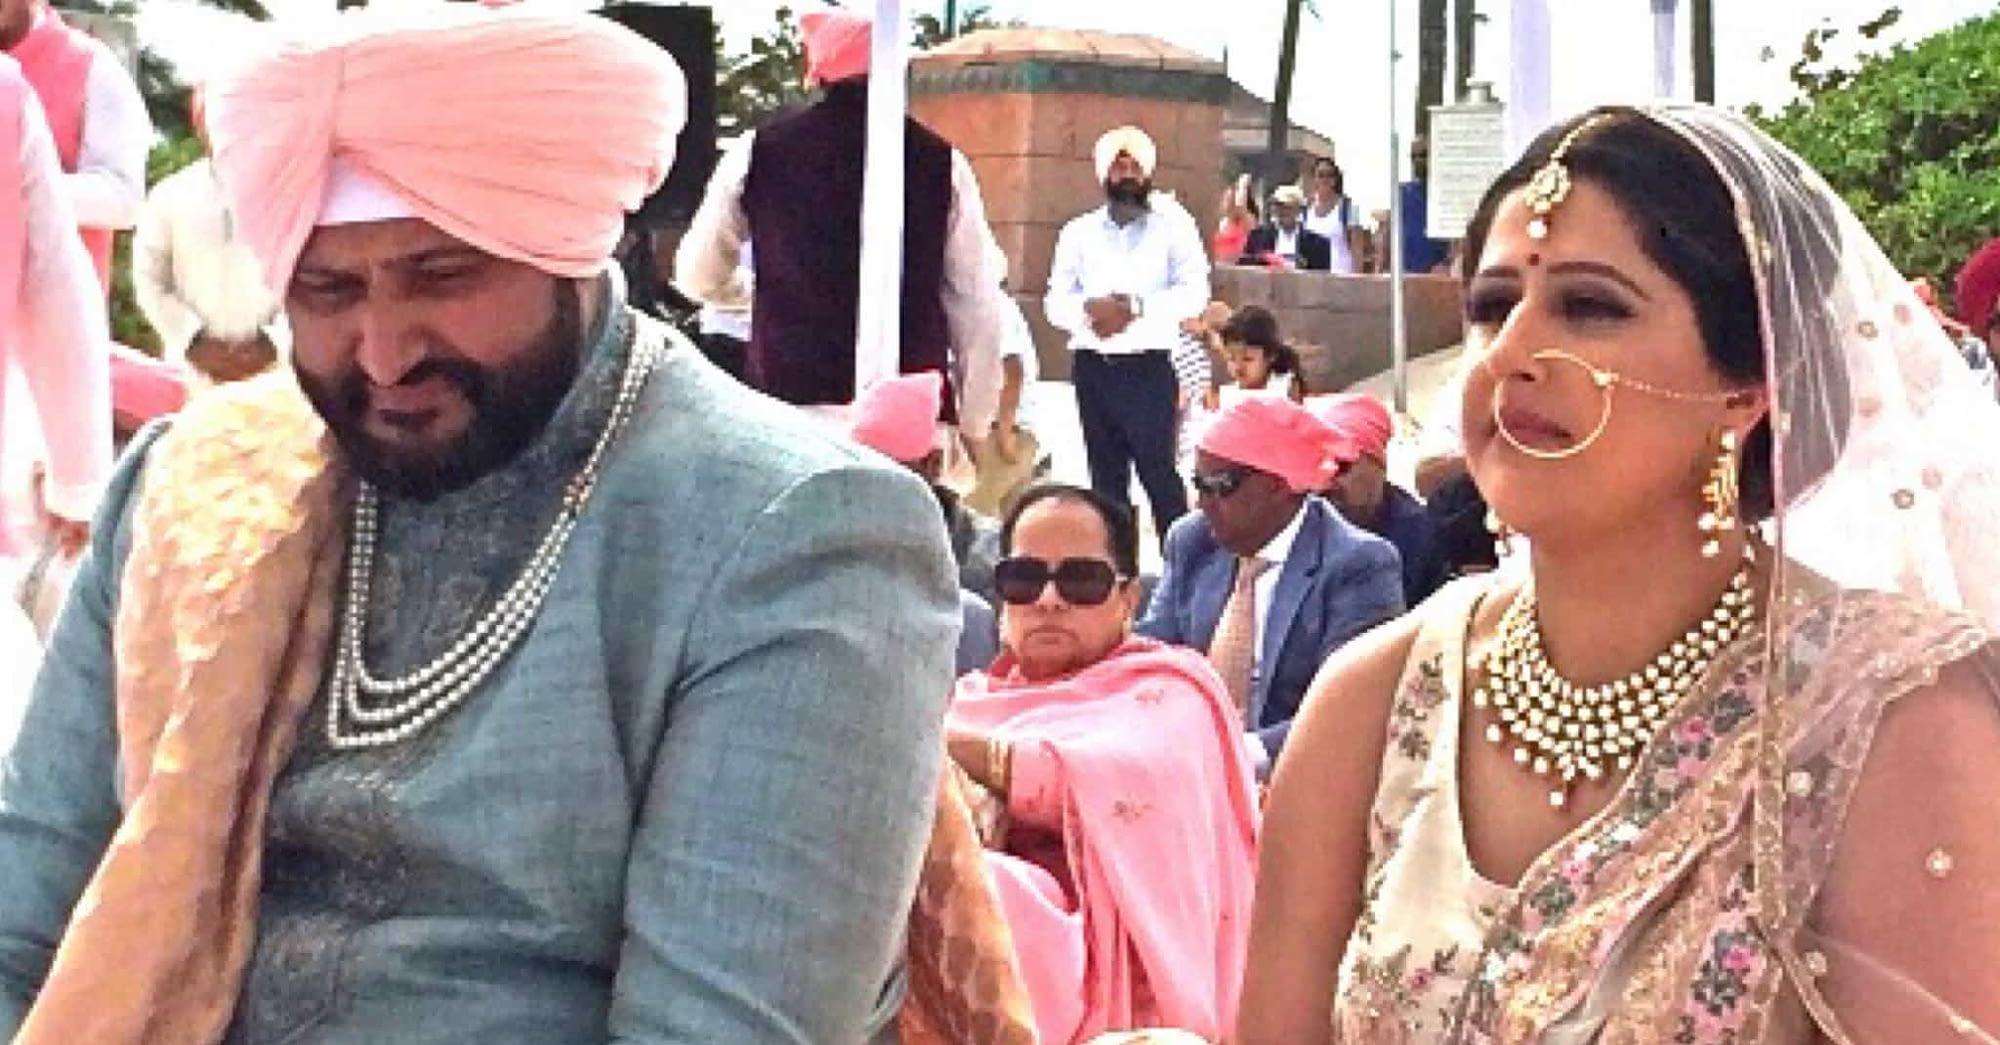 Sikh Wedding Officiant